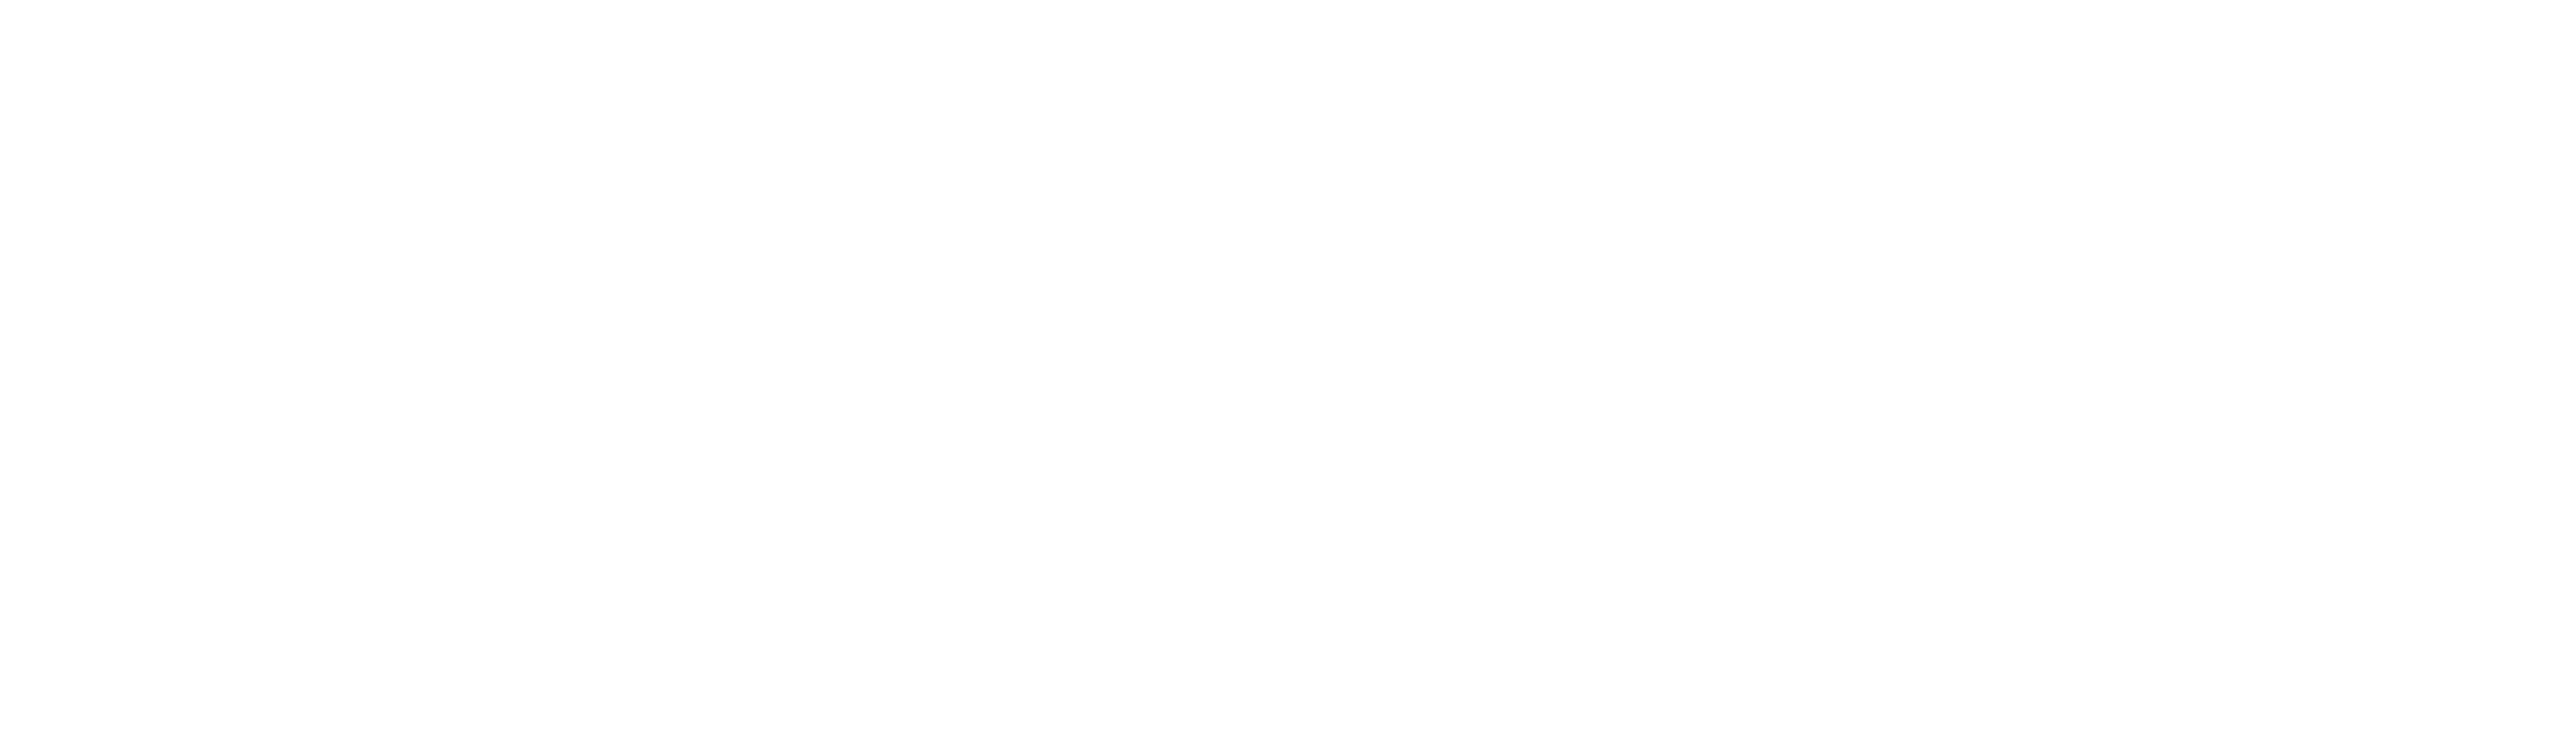 BBVA Consumer Finance